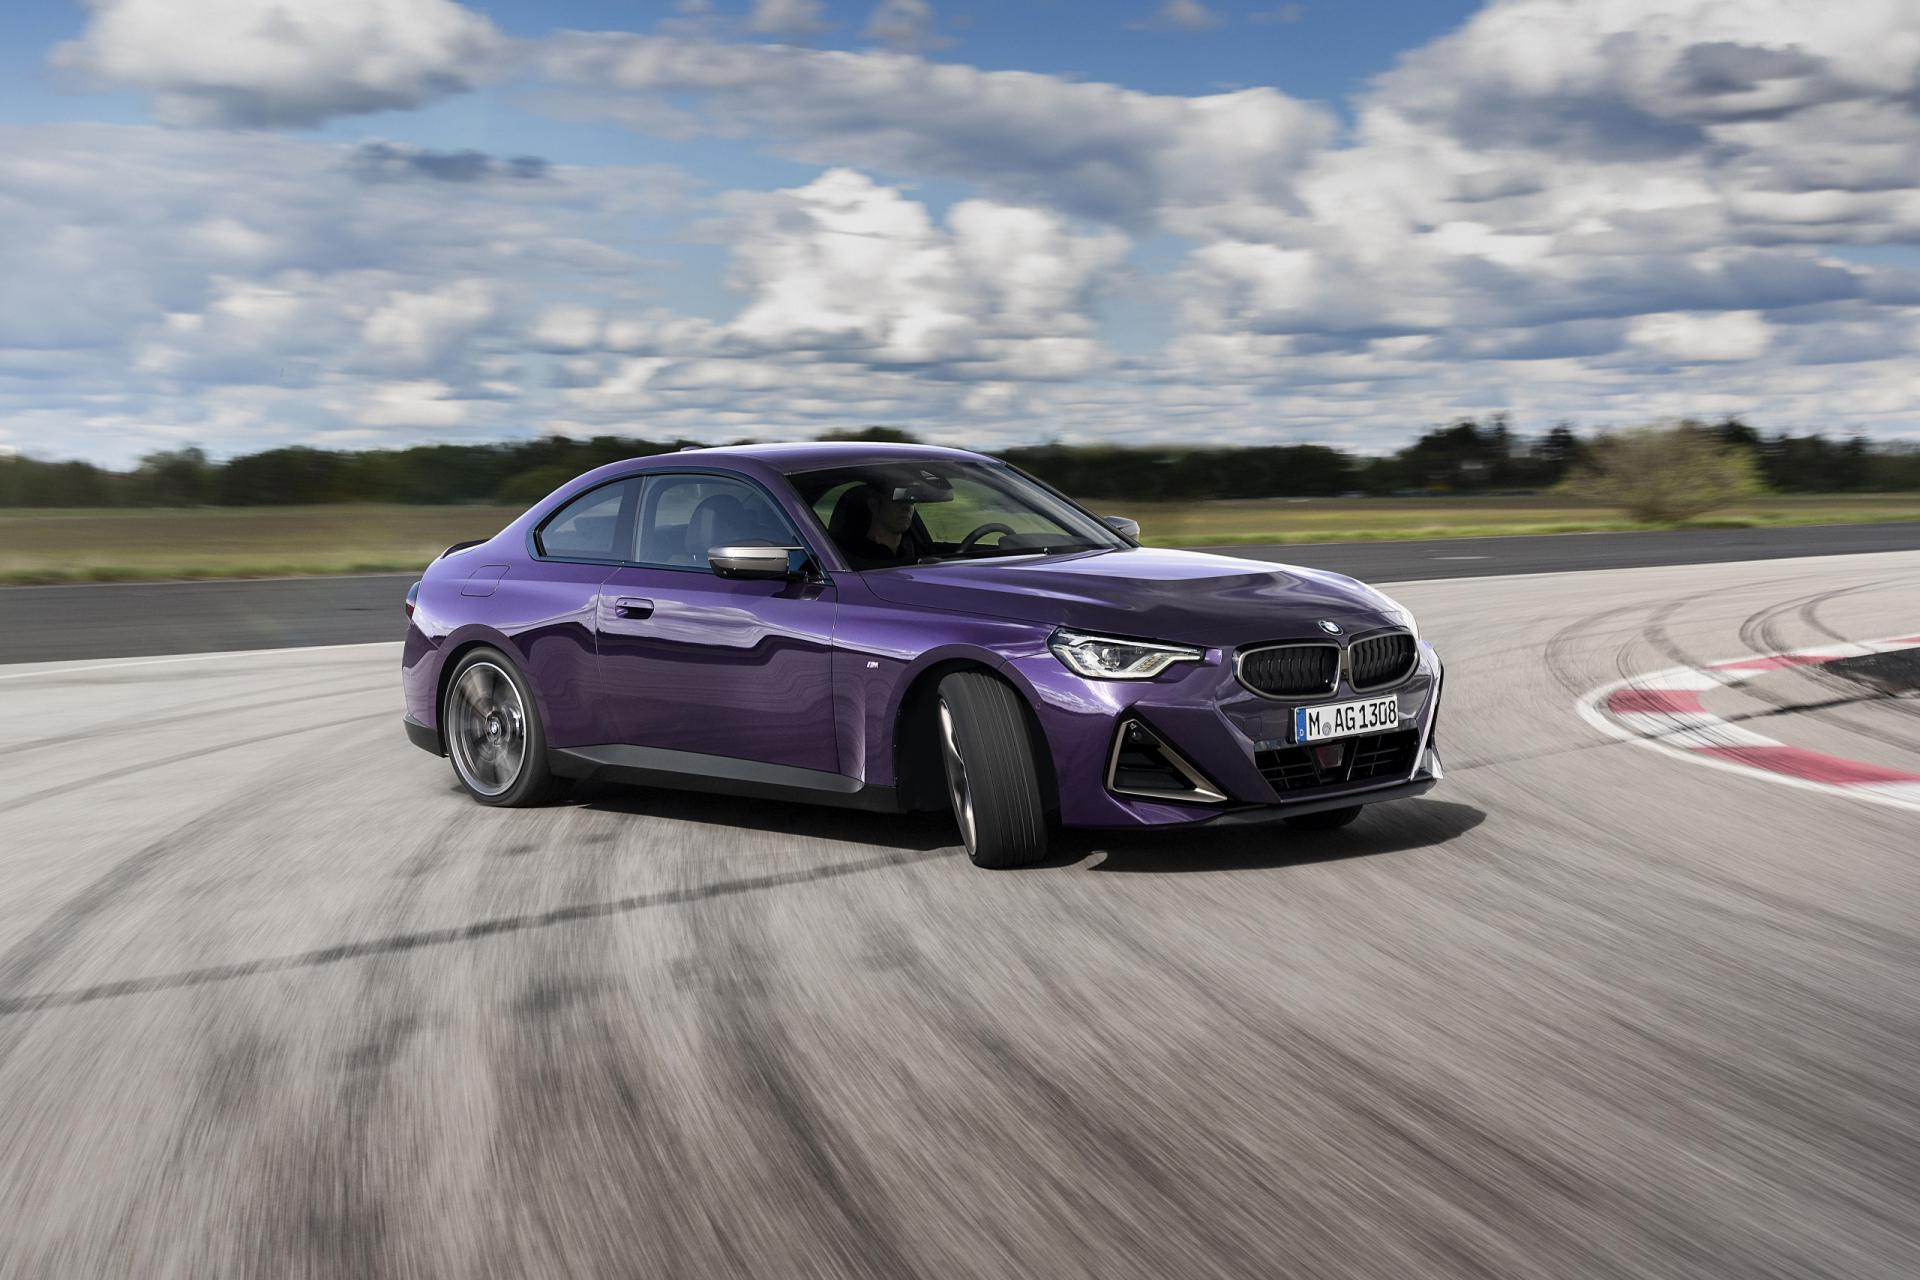 The new BMW 2 Series M240 xDrive